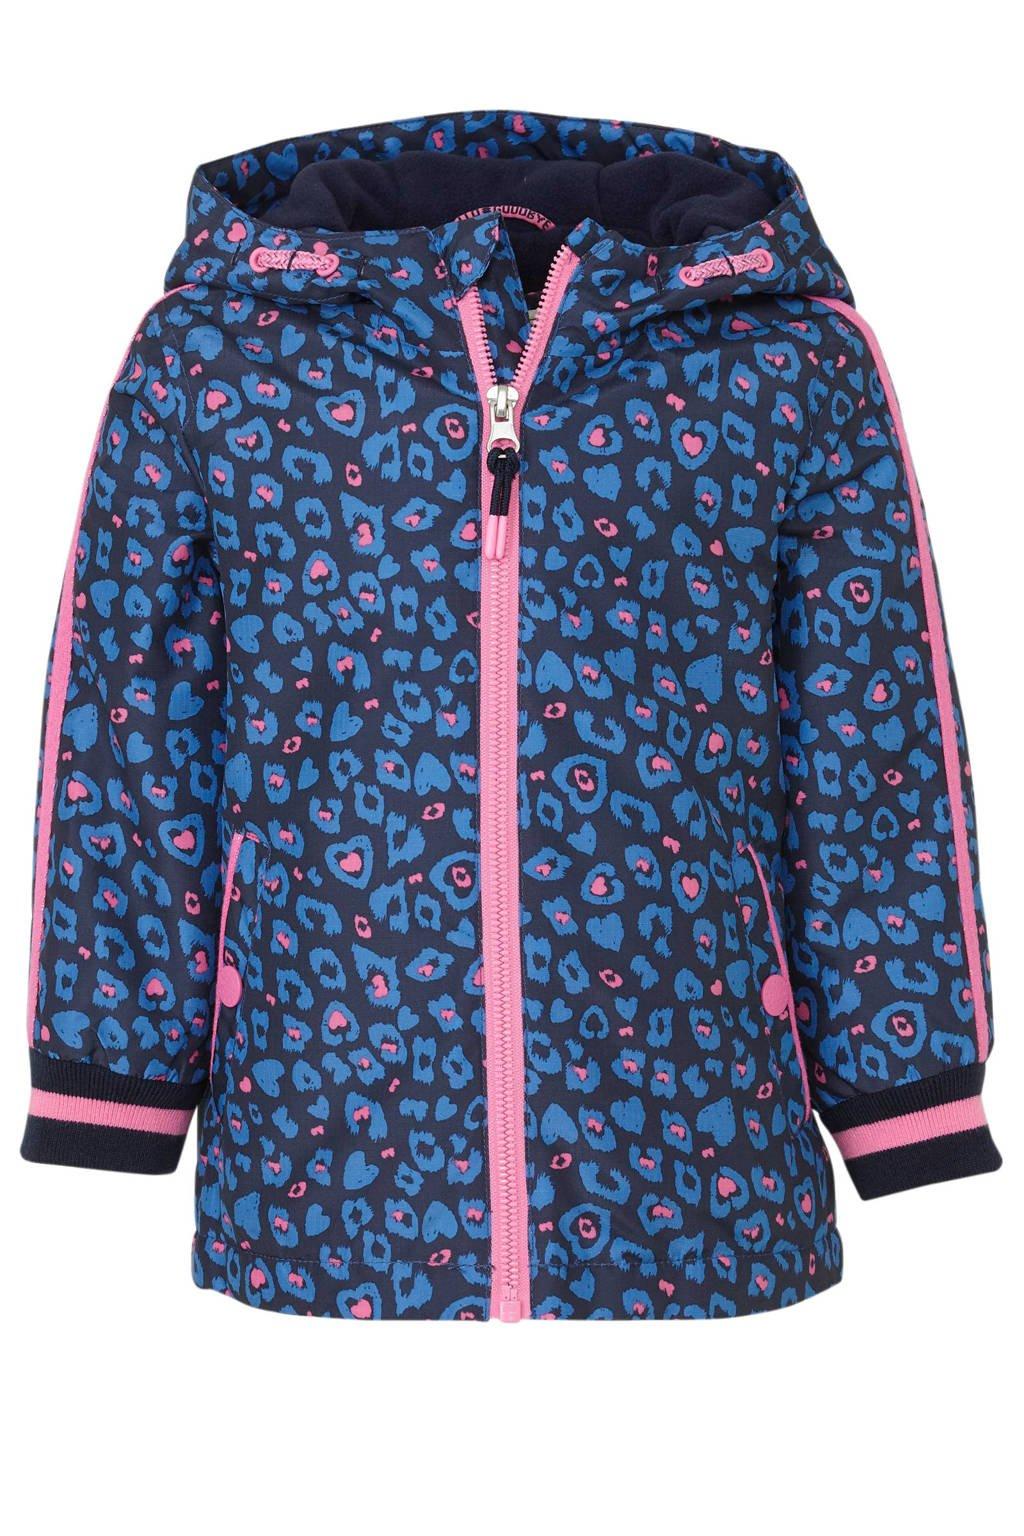 C&A Palomino tussenjas met contrastbies donkerblauw/blauw/roze